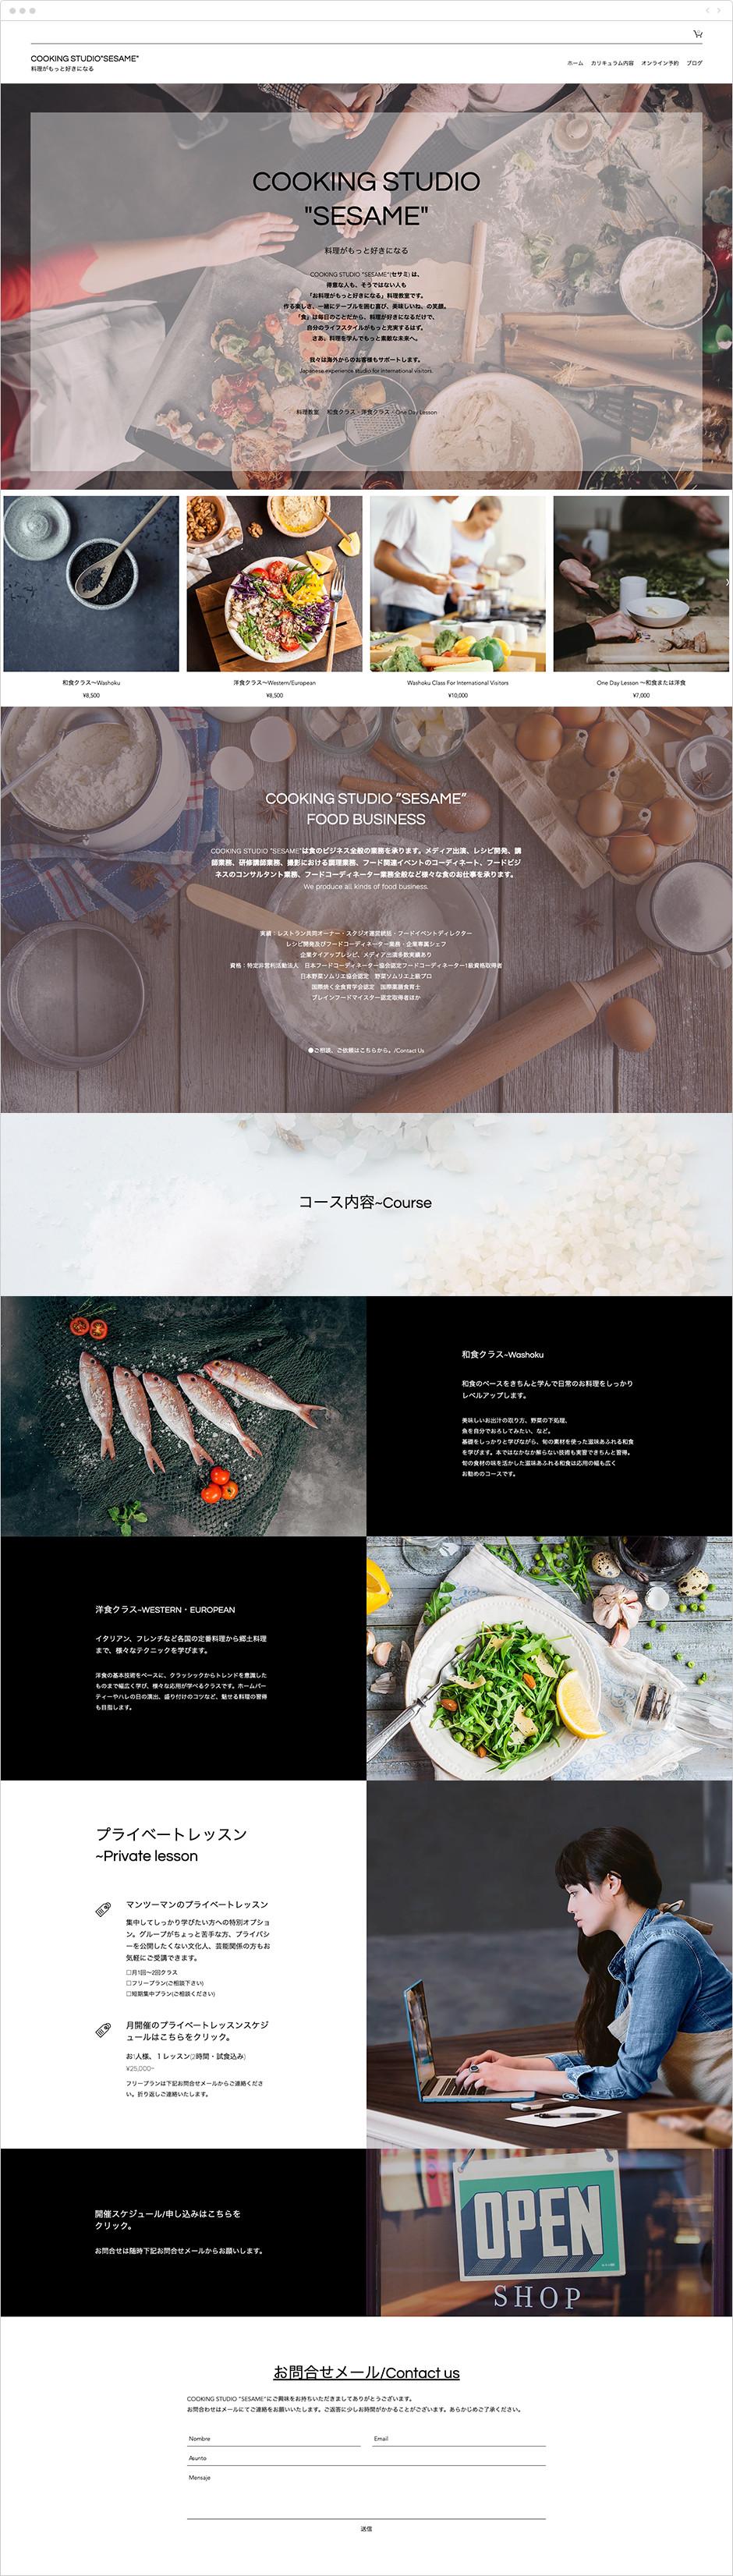 "Wix ADI サイト事例 COOKING STUDIO""SESAME"